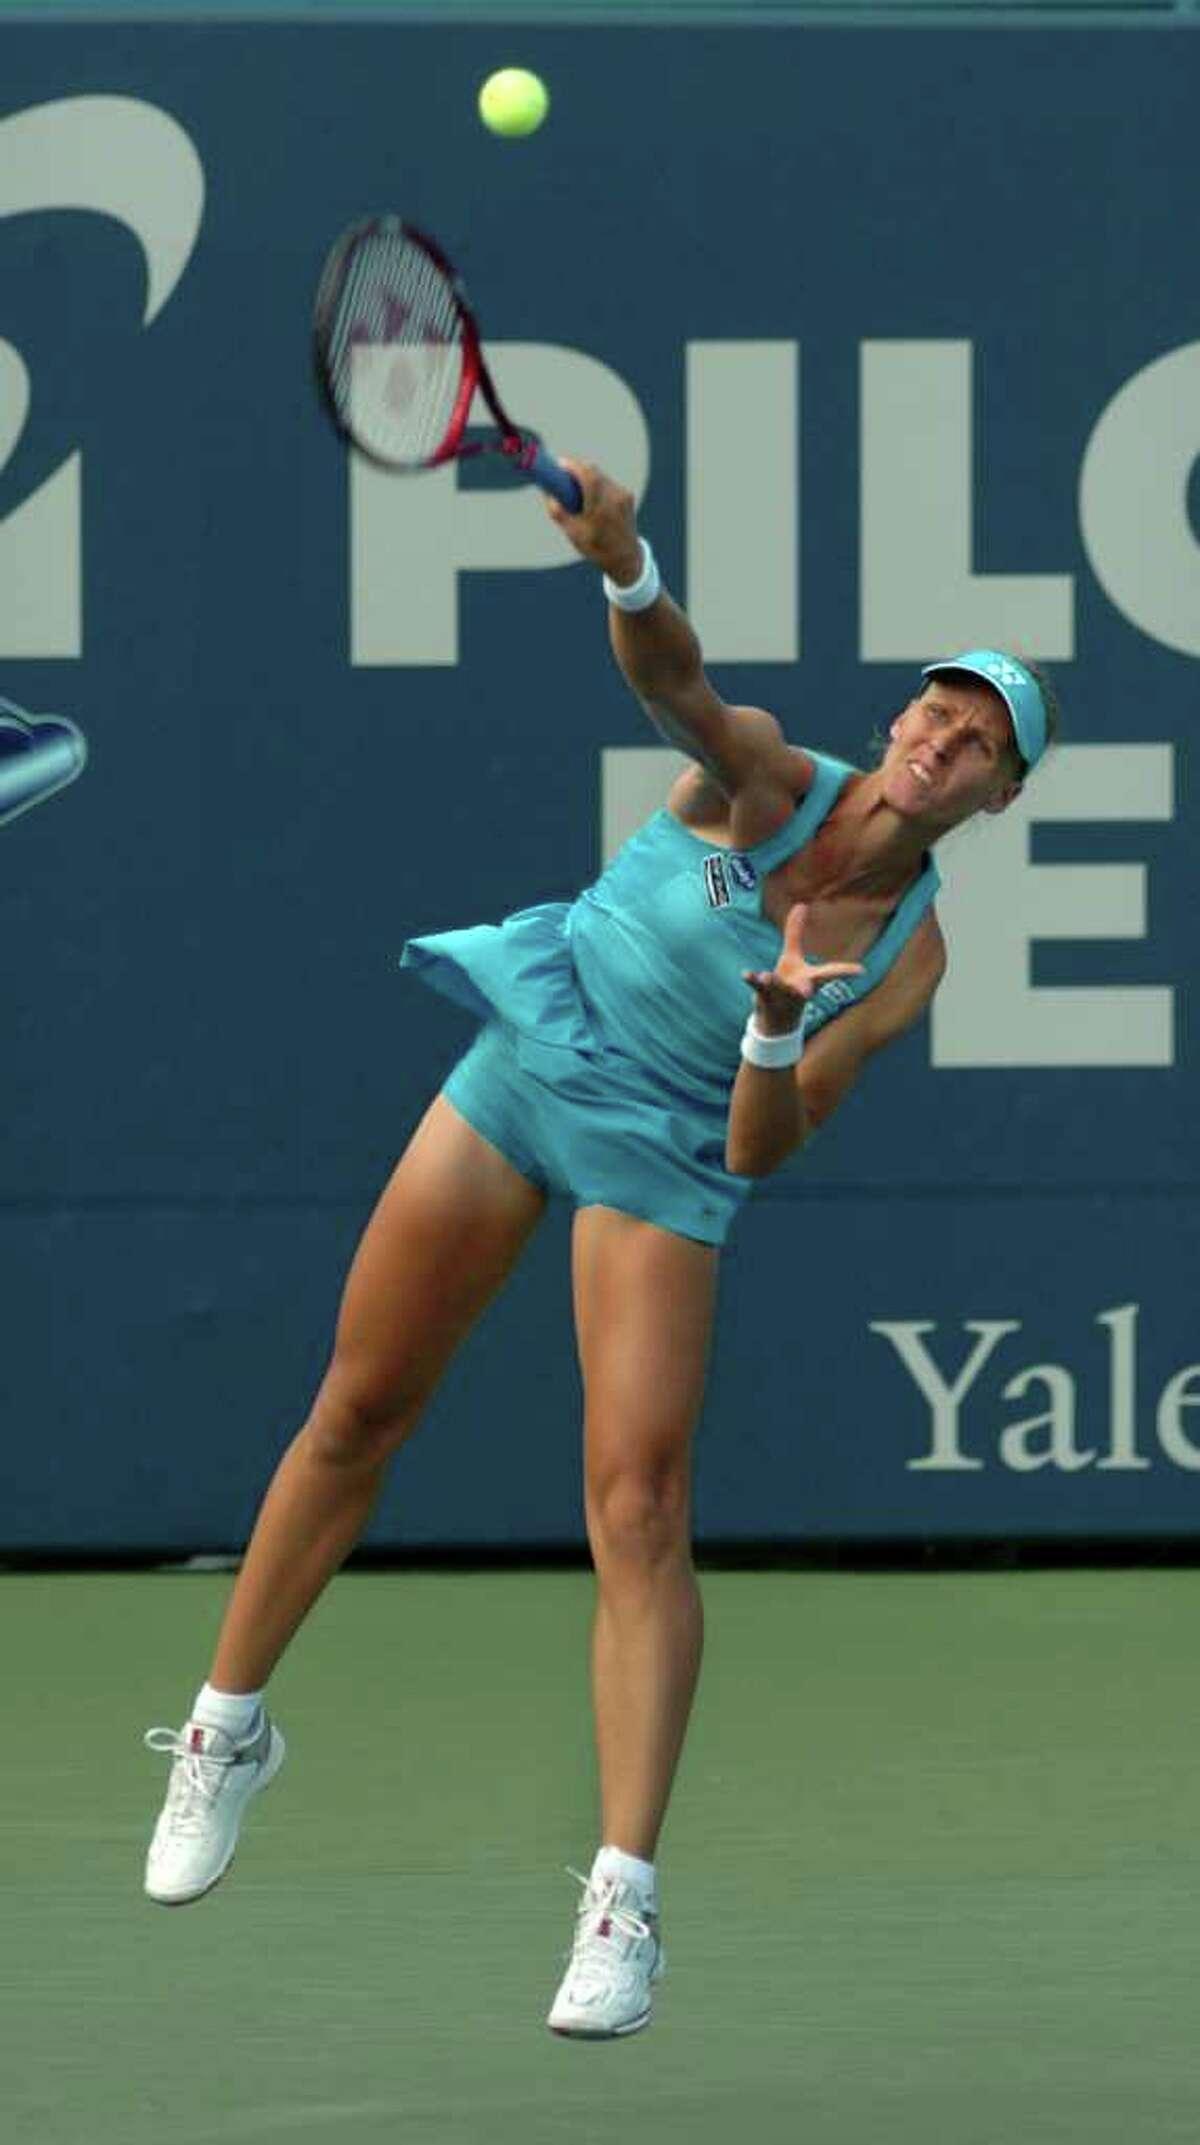 Elena Dementieva serves the ball to her opponent Marion Bartoli at the Pilot Pen tennis tournament in New Haven, Conn. on Thursday August 26, 2010. Dementieva beat Bartoli 6-3, 3-6, 6-2.